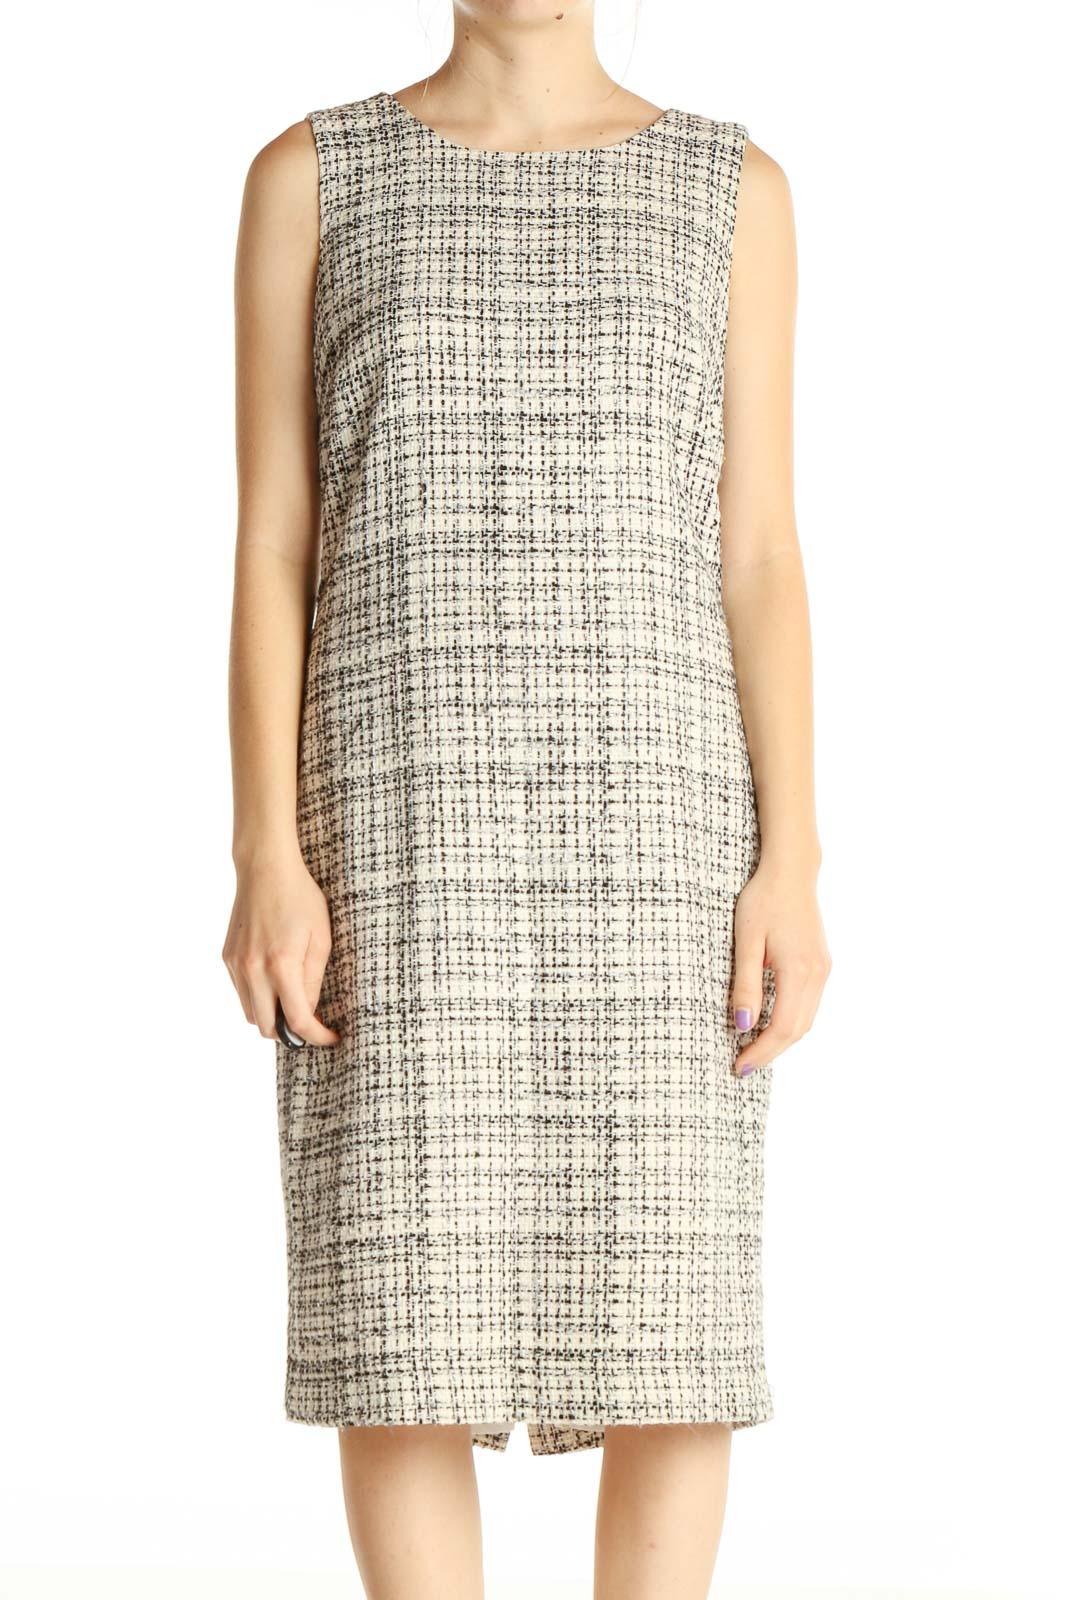 Beige Textured Classic Sheath Dress Front